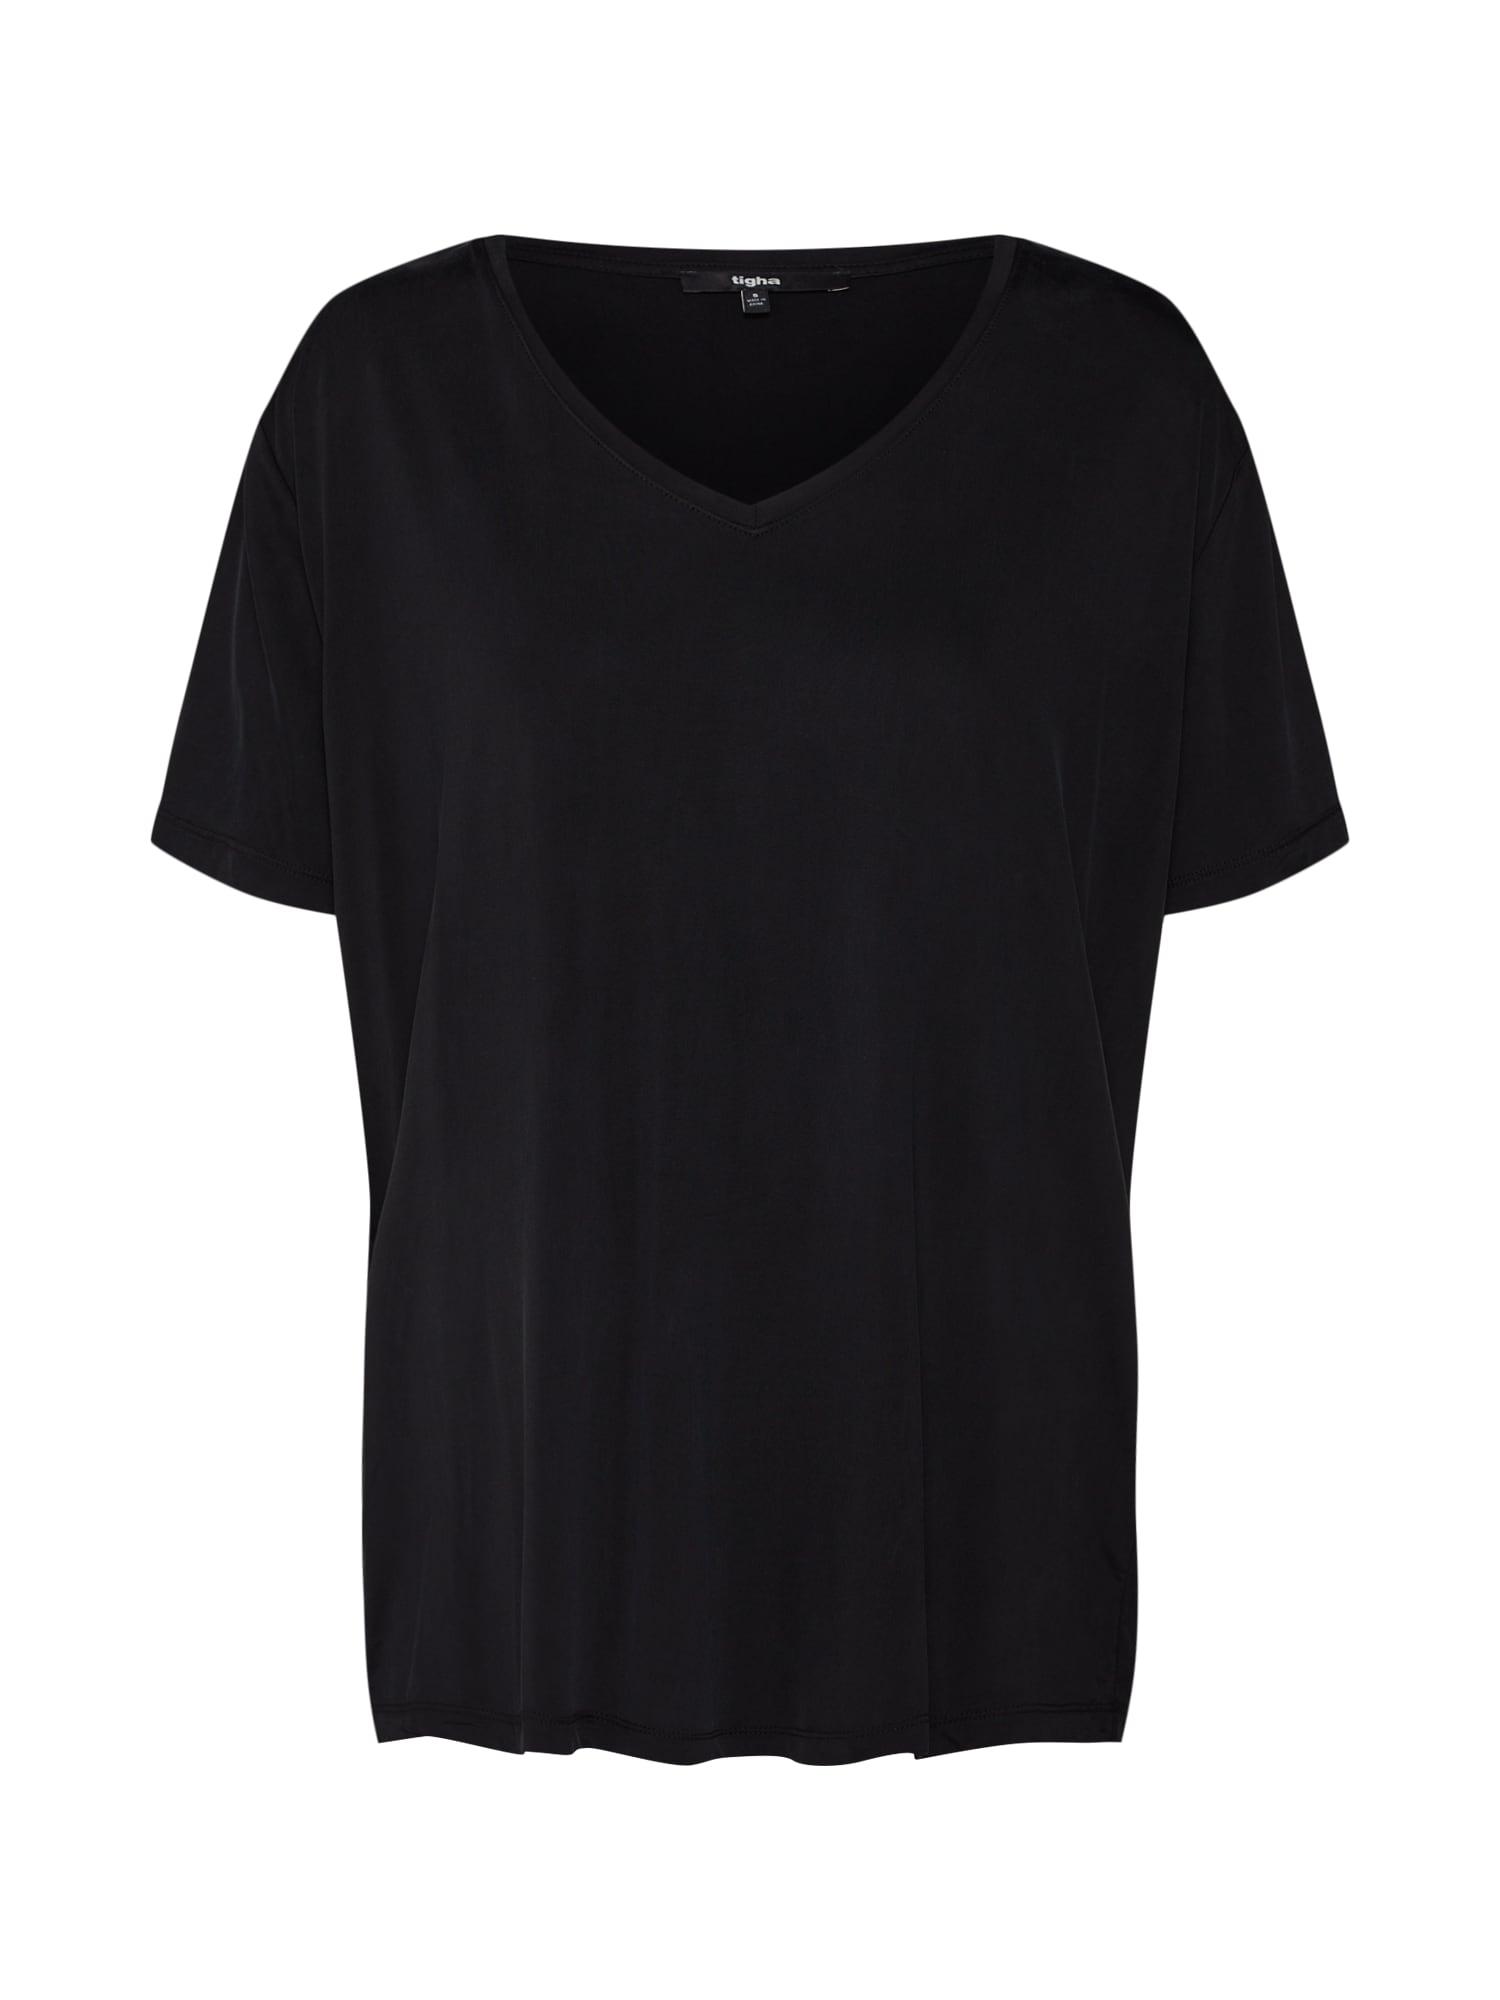 Oversized tričko Trisha černá Tigha